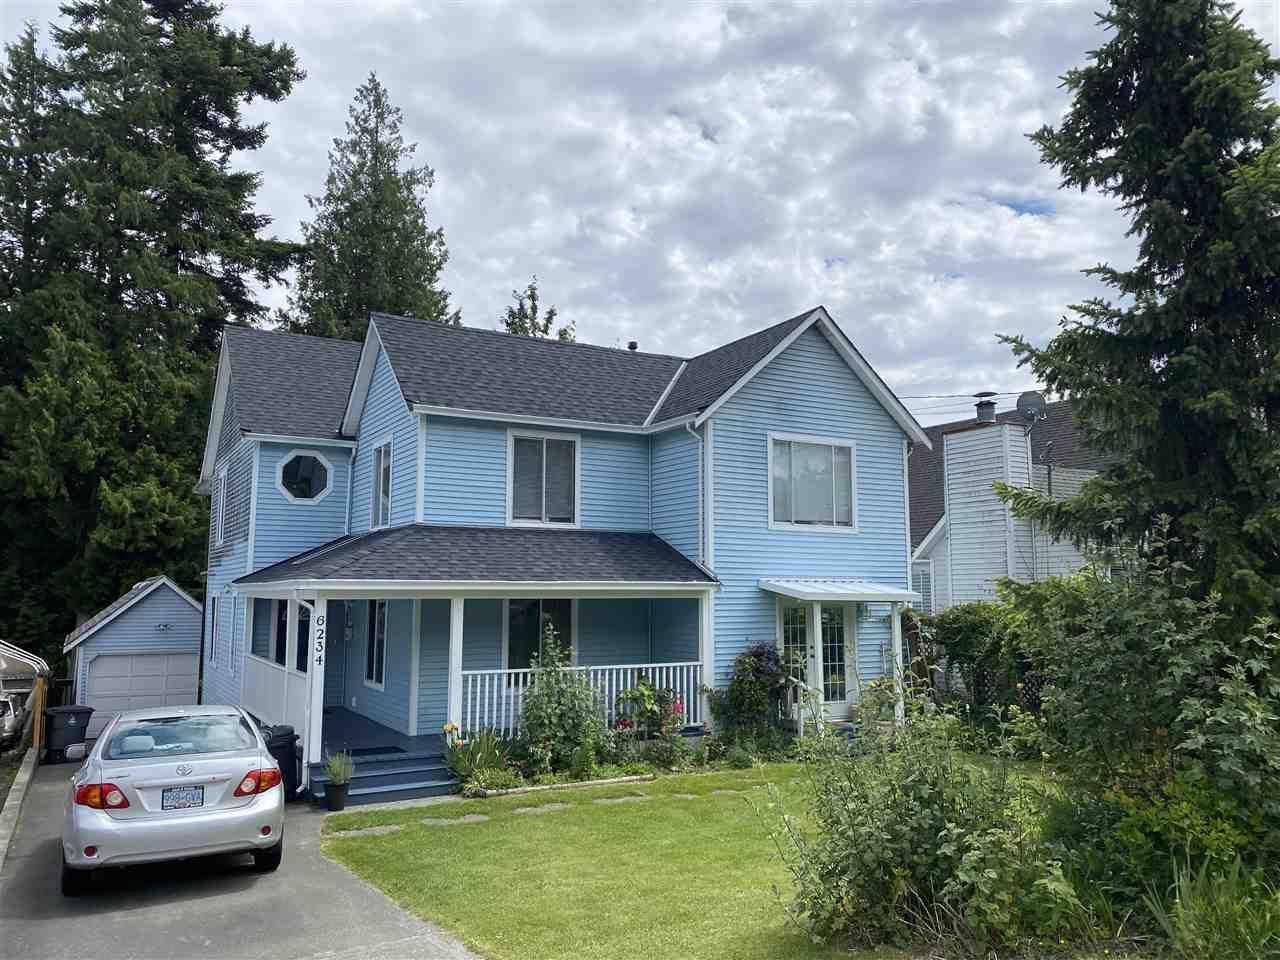 Main Photo: 6234 134 STREET in Surrey: Panorama Ridge House for sale : MLS®# R2464718